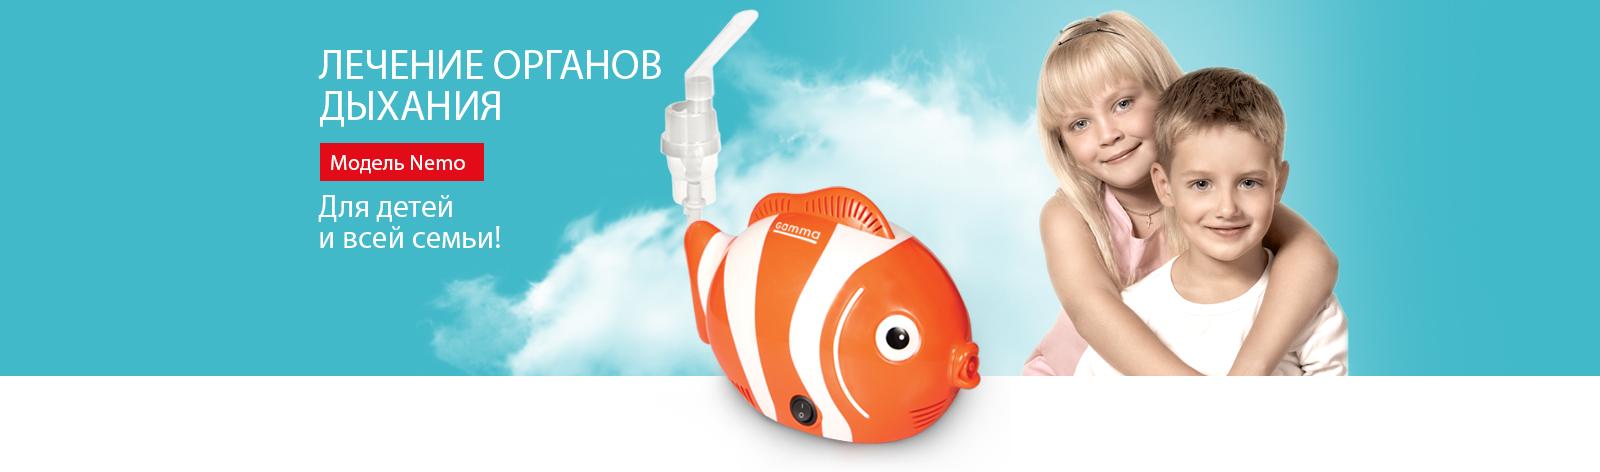 Компрессорный небулайзер Gamma Nemo - для детей и всей семьи! Источник: http://askorbinka.com.ua/katalogh-tovarov/medicinskaja-tekhnika/nebulajzery/kompressornye/detskij-kompressornyj-nebulajzer-gamma-nemo © askorbinka.com.ua